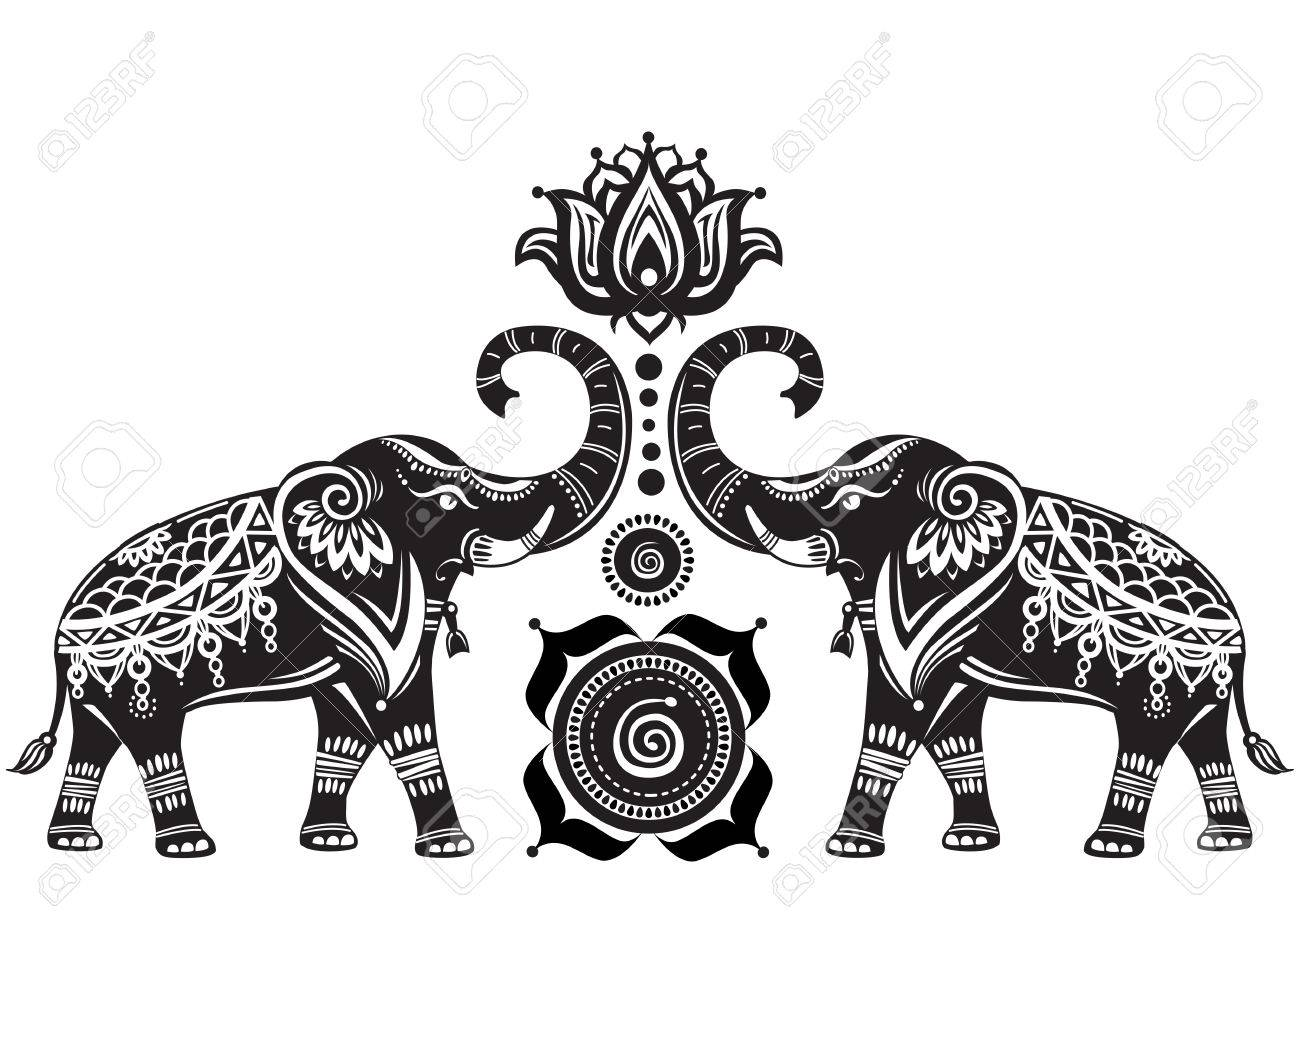 Stylized decorated elephants and lotus flower - 51213191